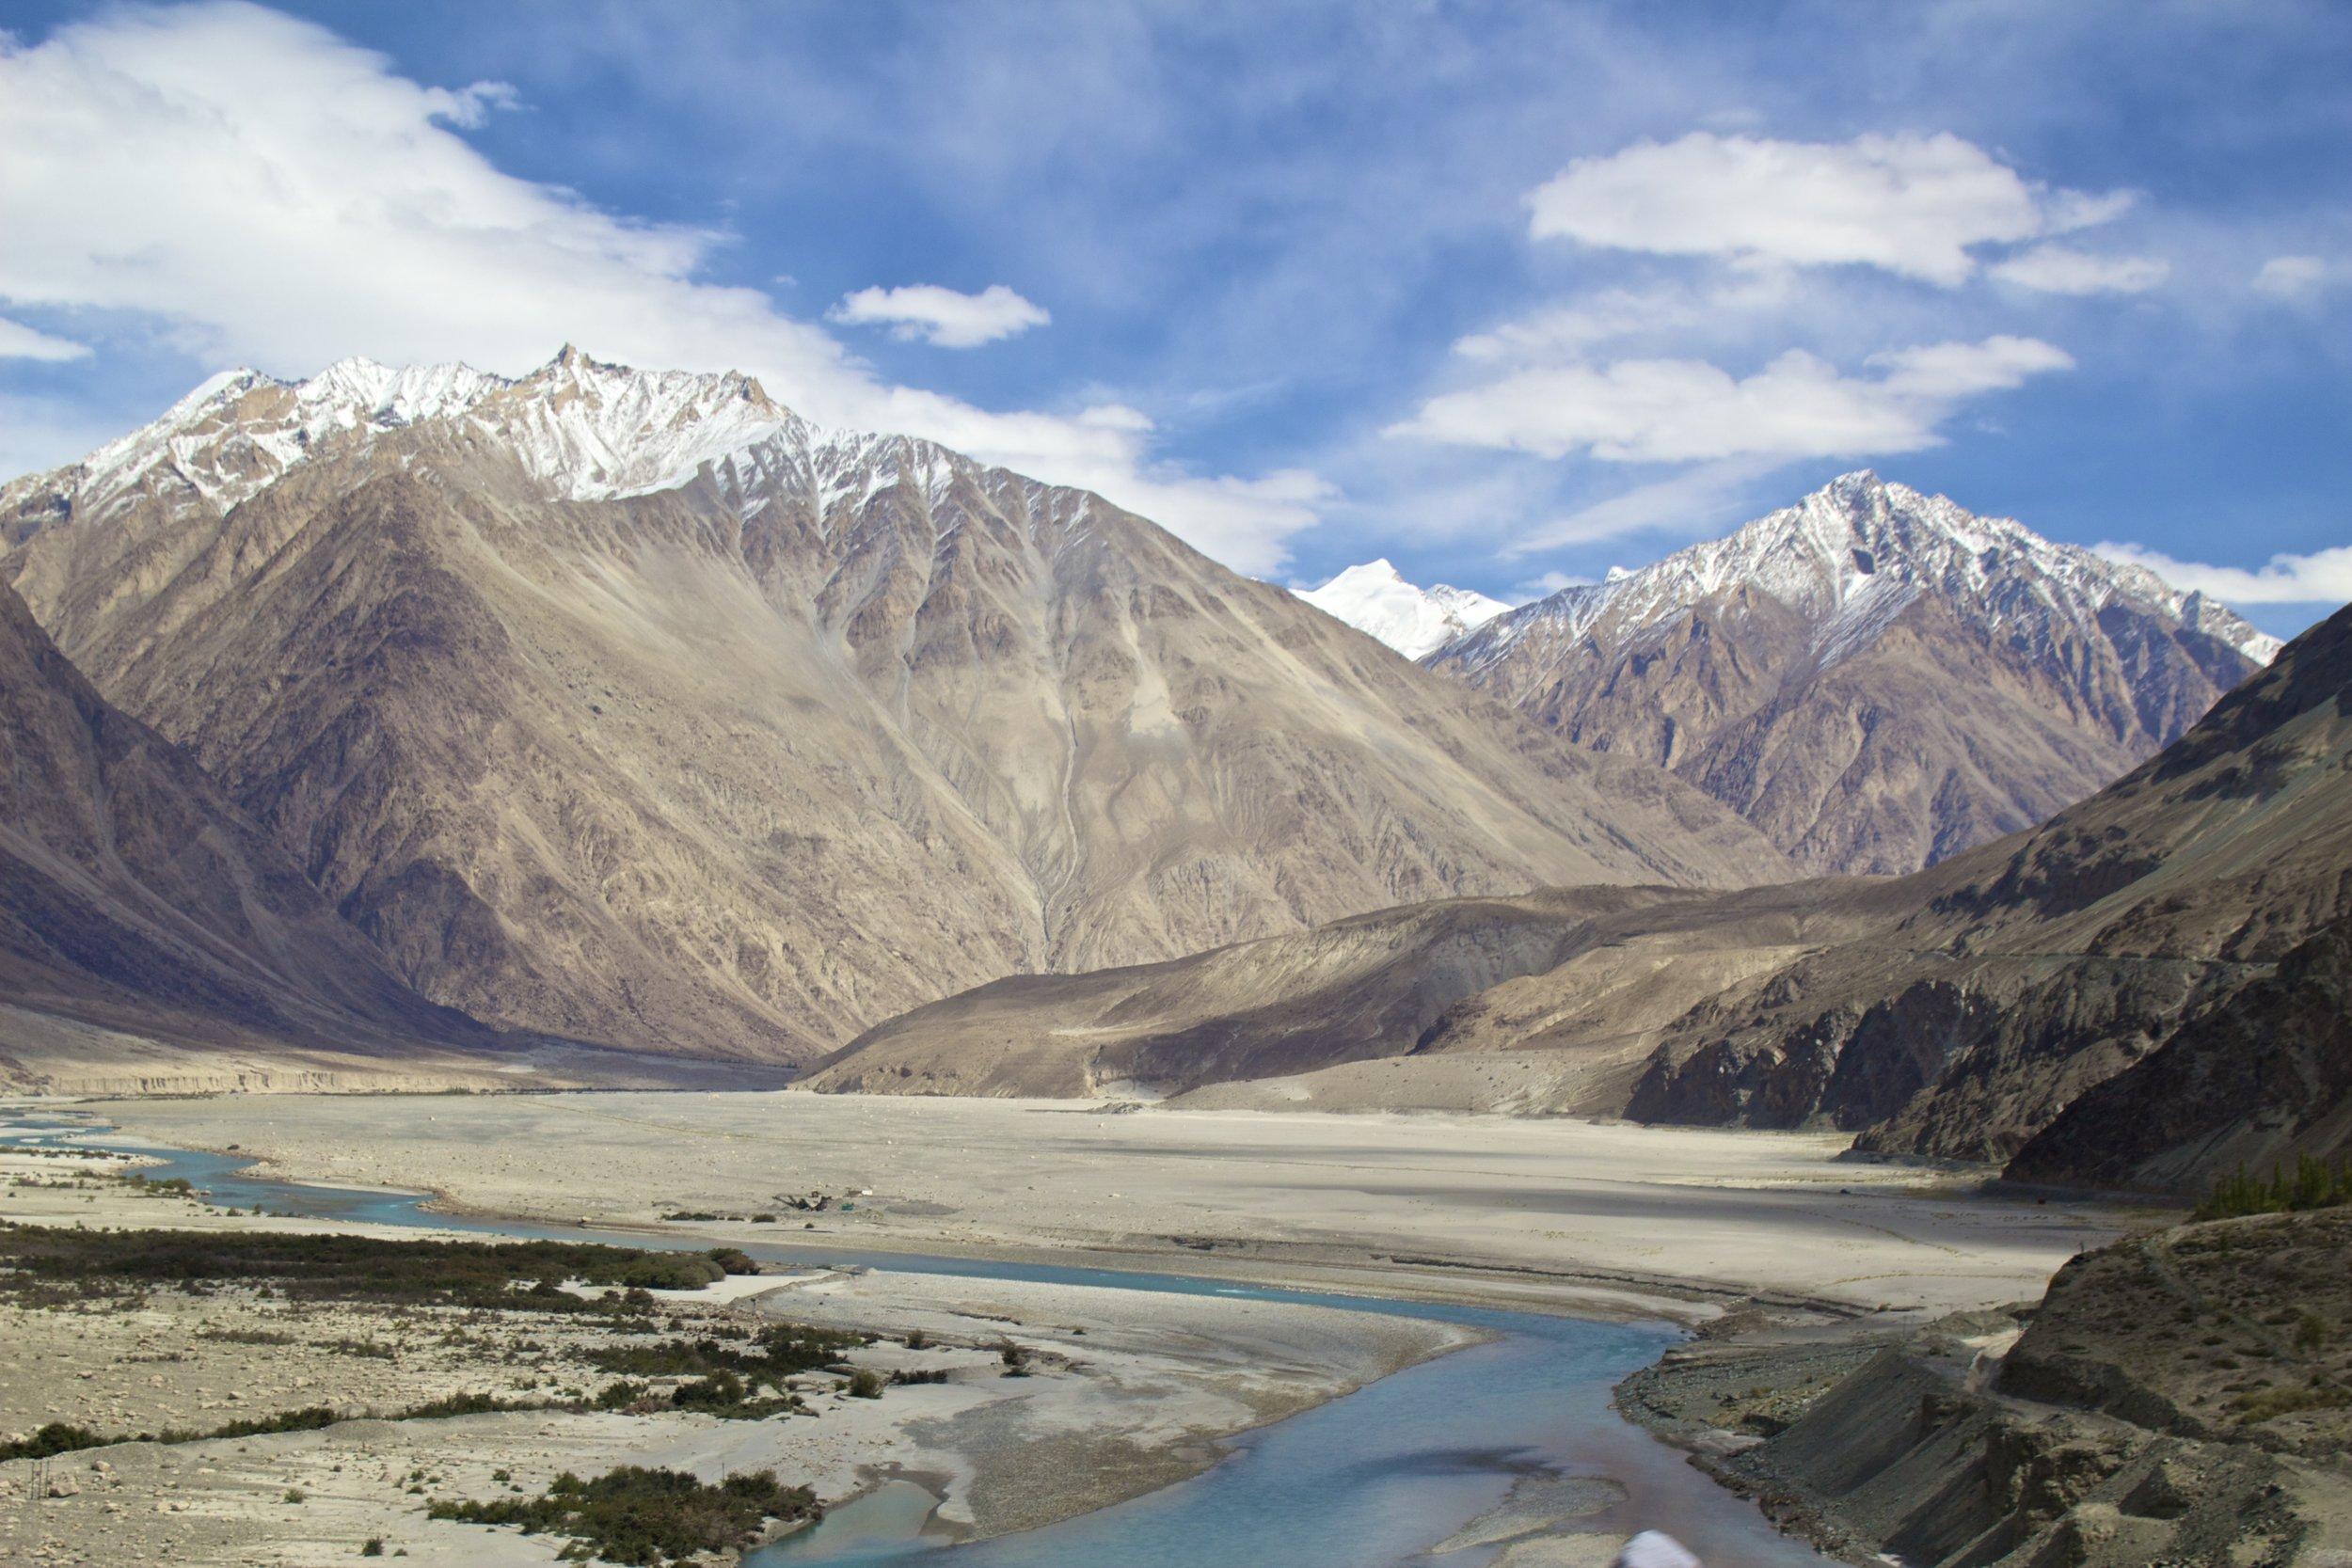 Shyok River Ladakh Gilgit Baltistan Indian Himalayas Nubra Valley 3.jpg